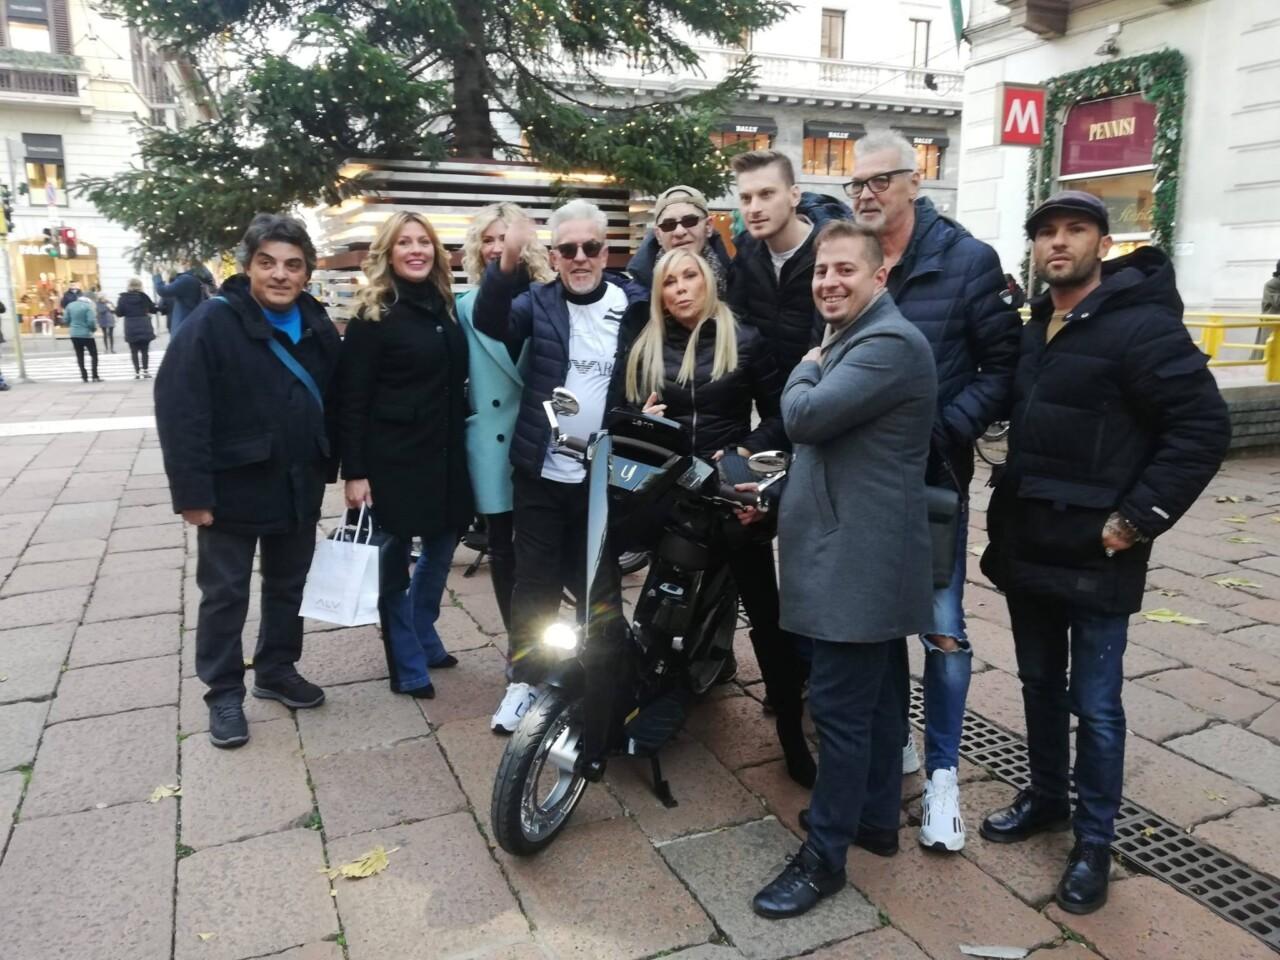 Green Days Tour a Perugia 12 dicembre 17,30 Piazza IV novembre